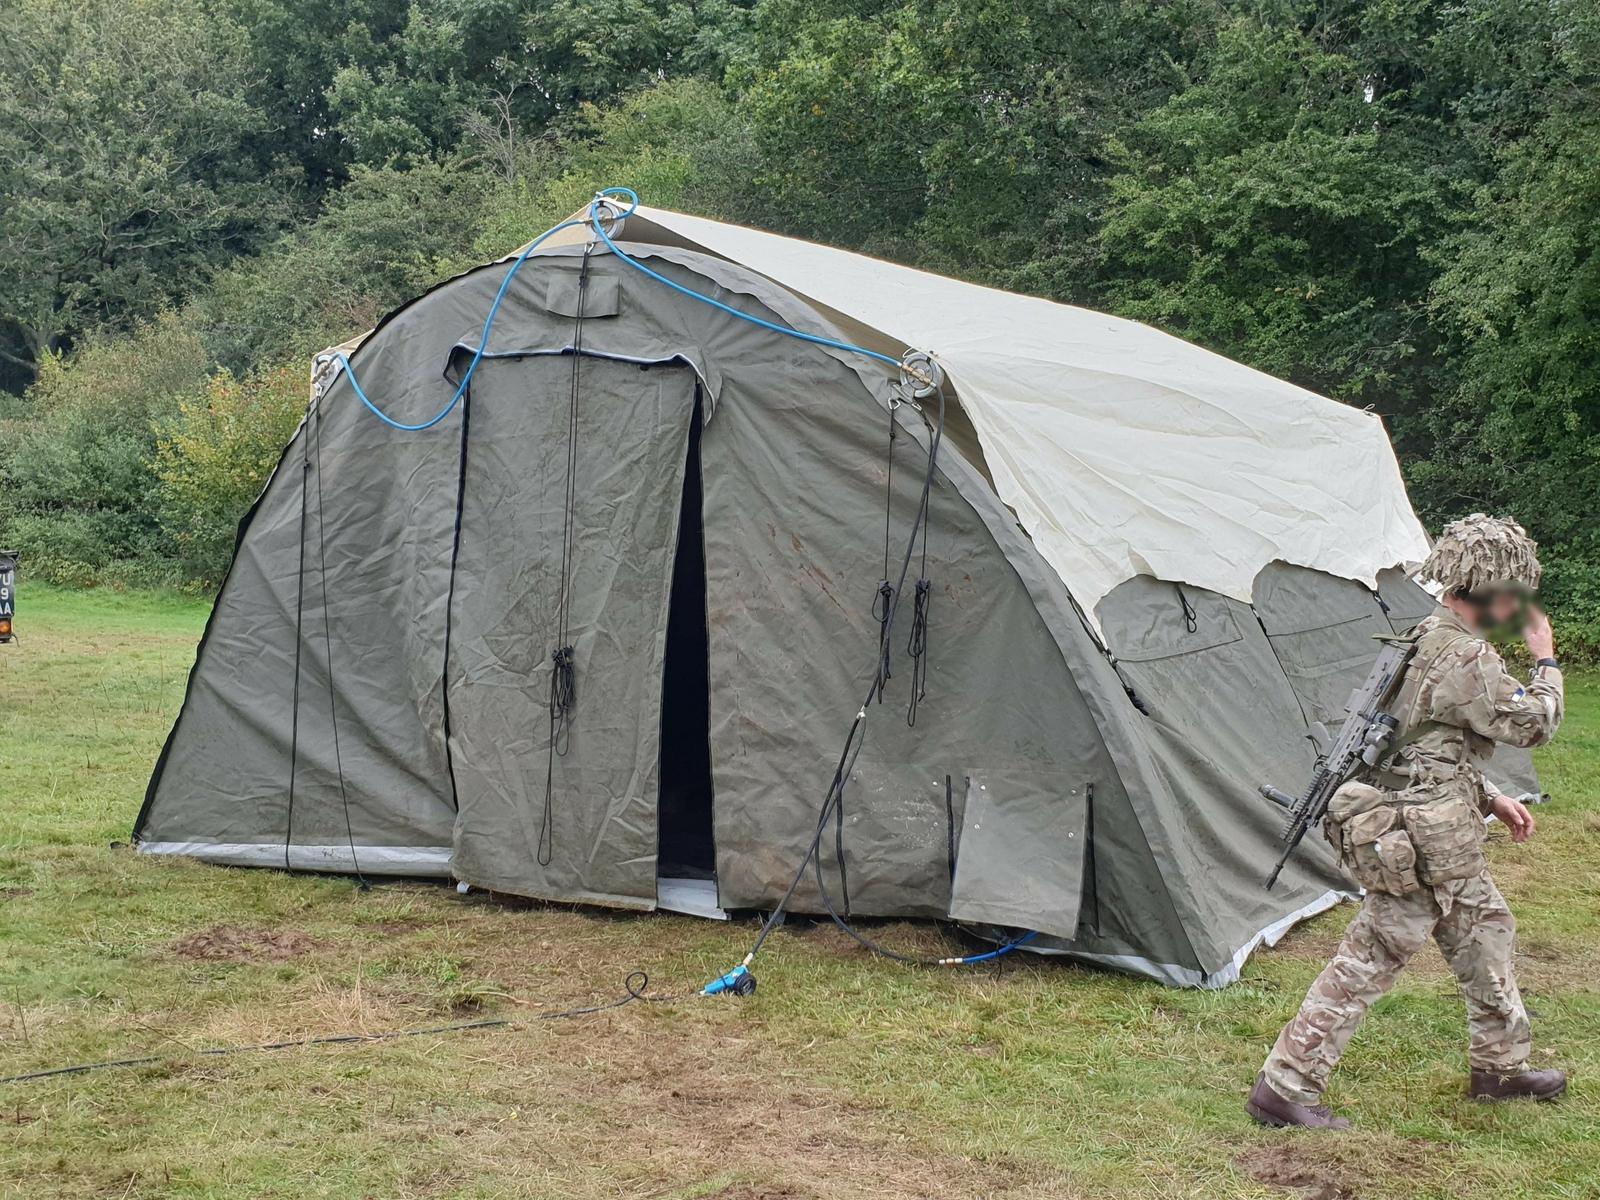 NIXUS PRO Tents with British Army